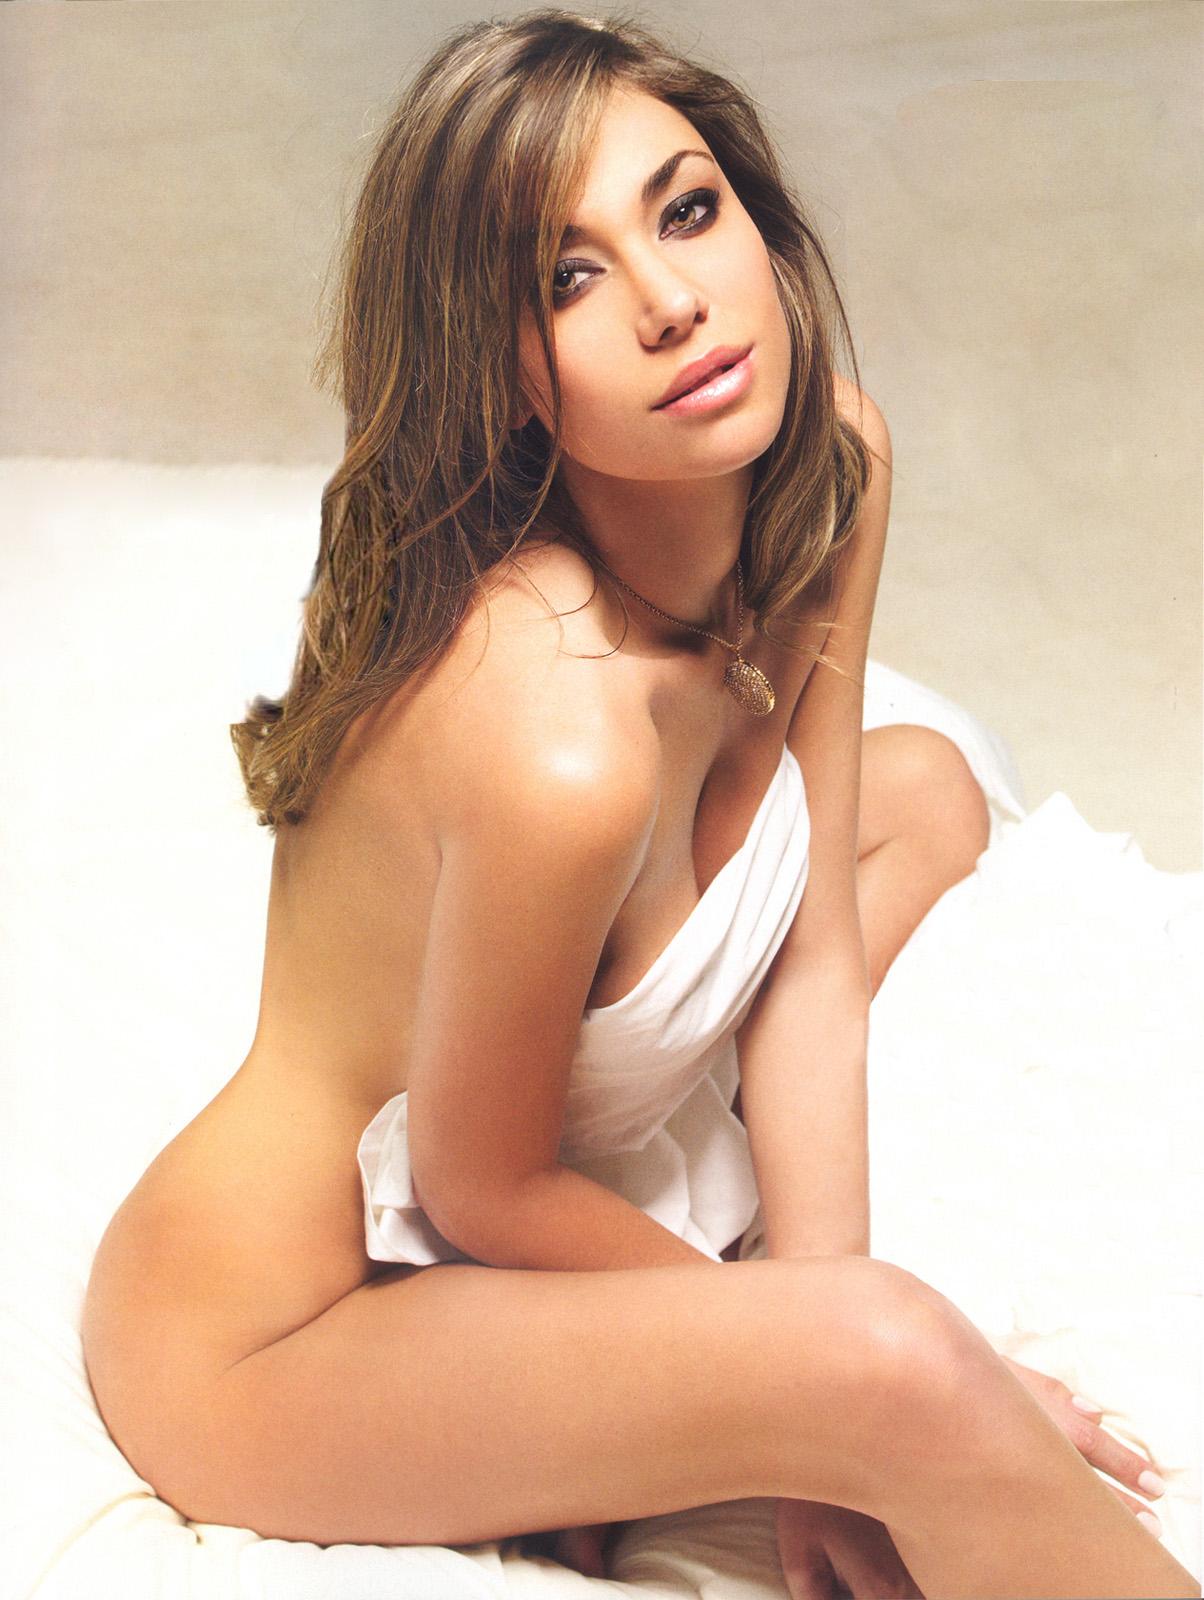 Nov 20, 2009 ? Maryse Naked pics of kelly kelly sajt bugarske auto placeva ...